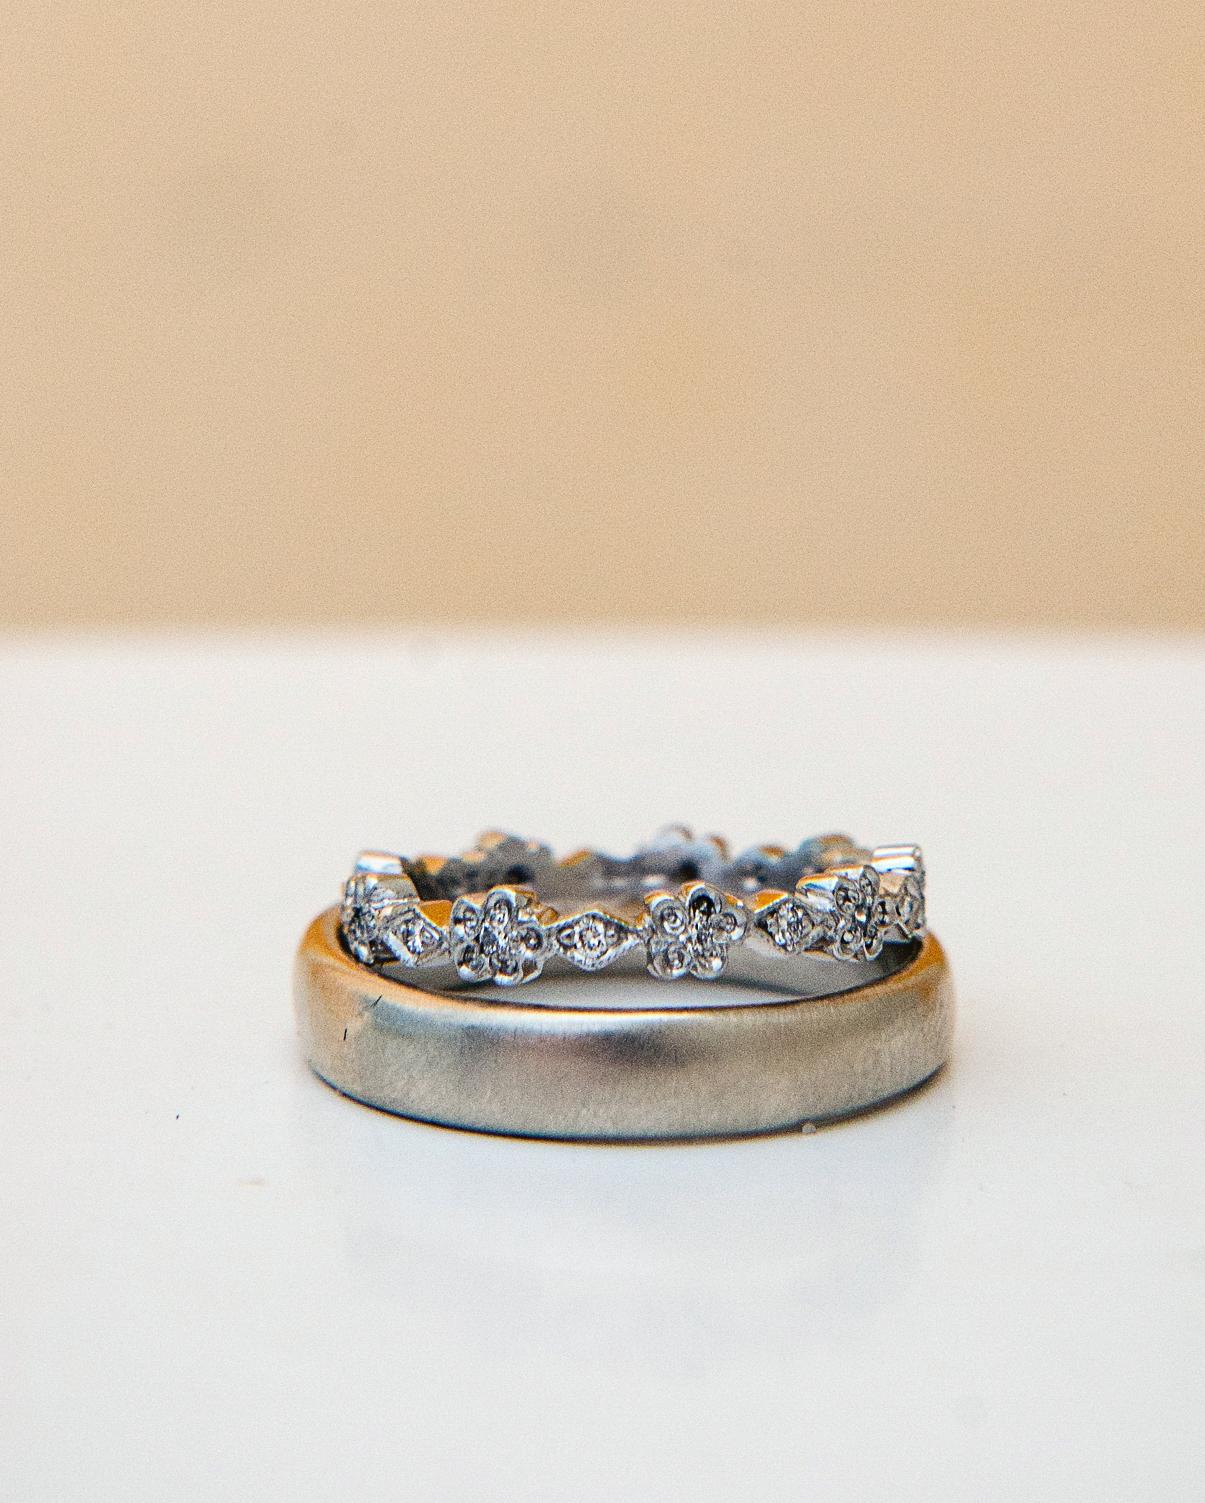 rachel-andrew-wedding-rings-006-s112195-0915.jpg